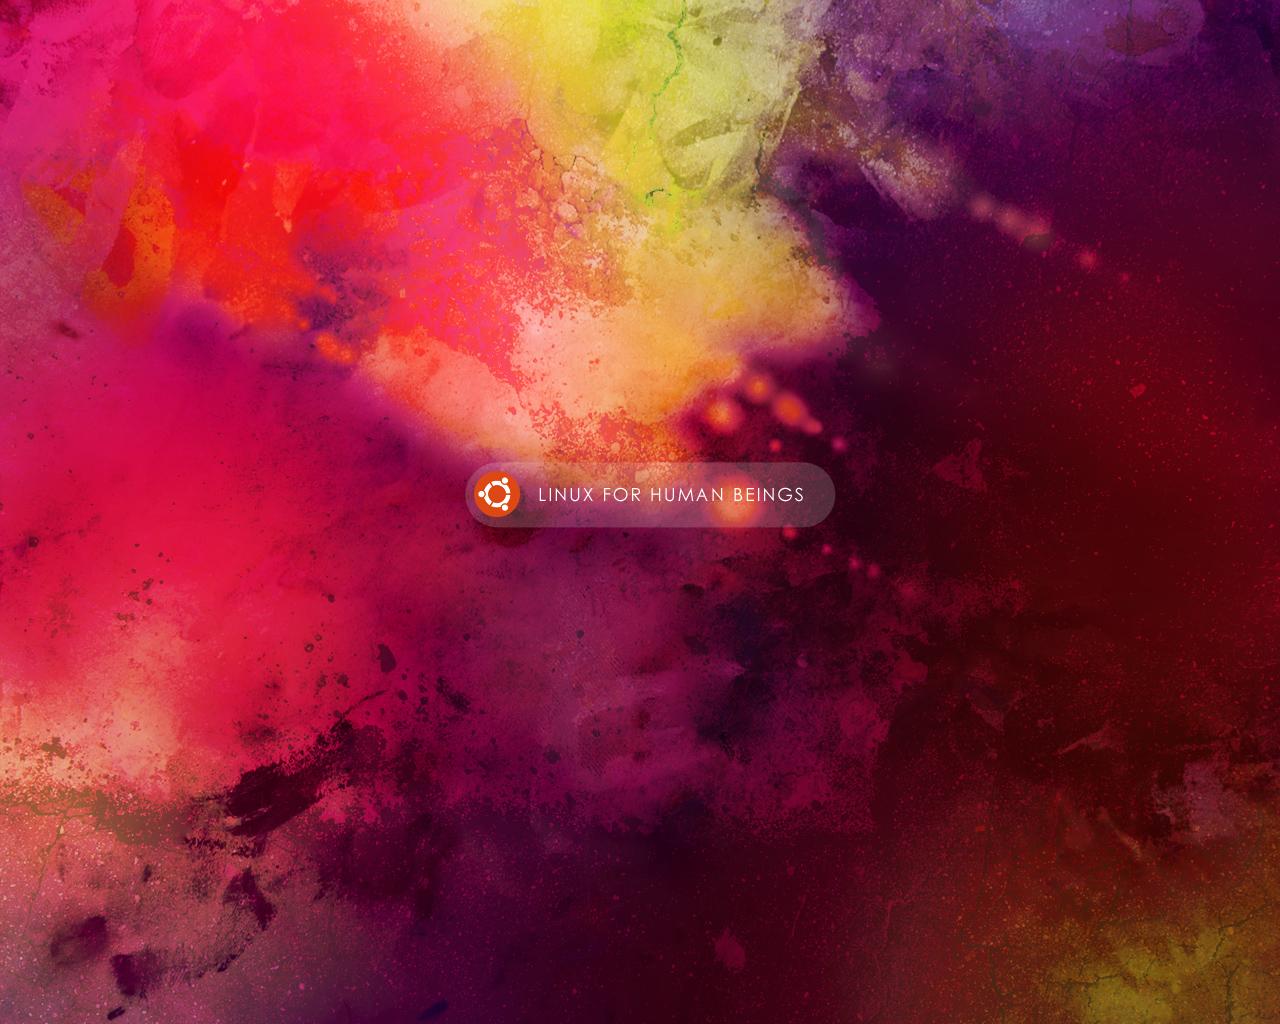 ubuntu linux for human beings by vaccieaux